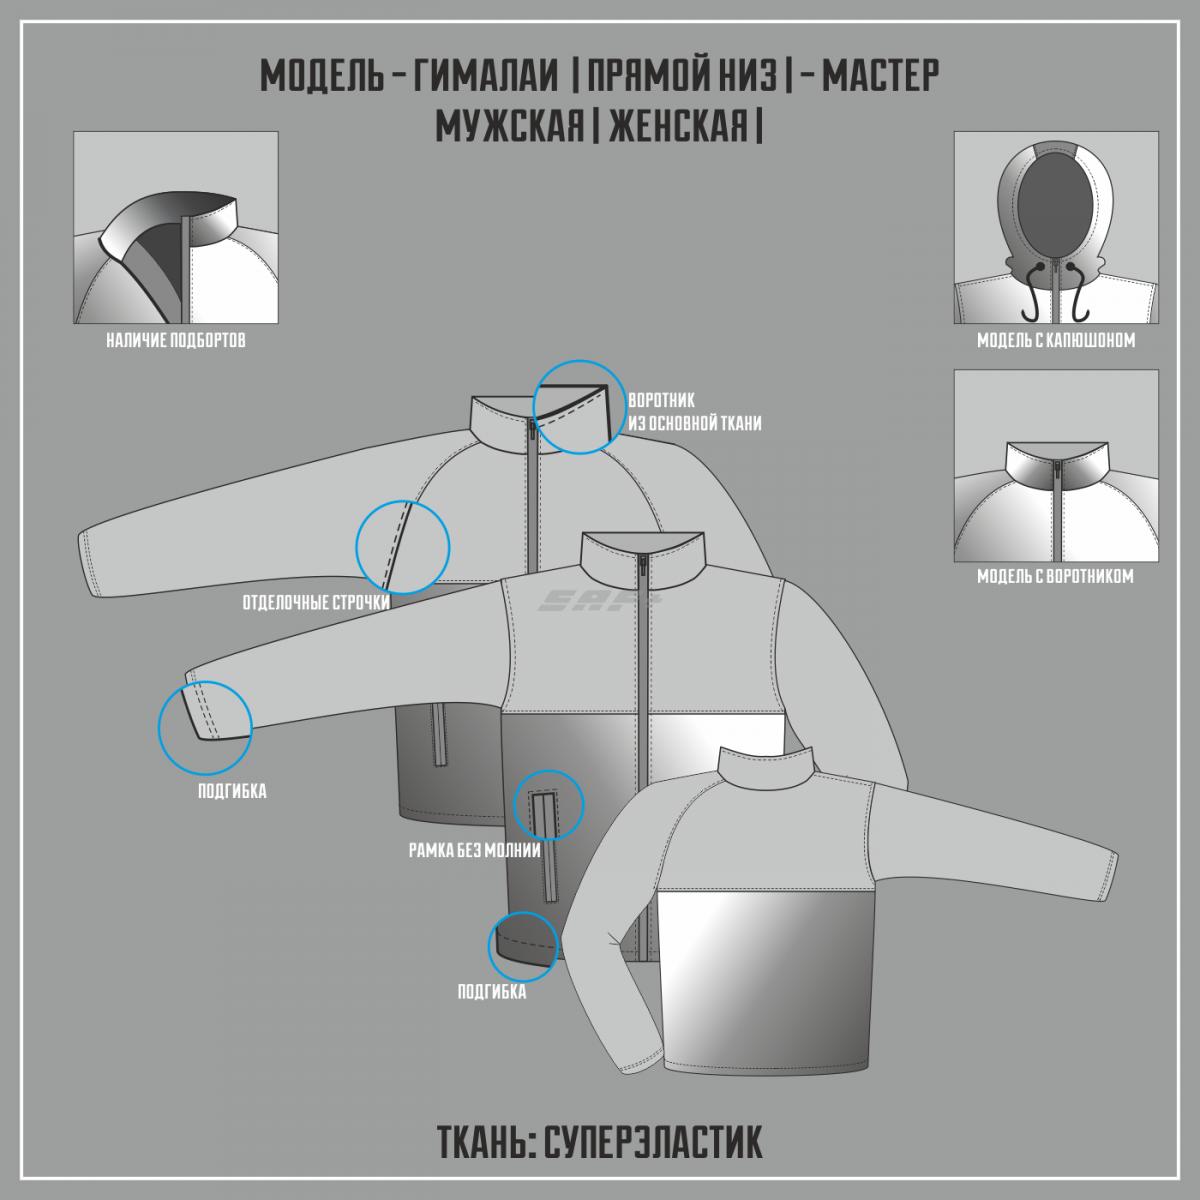 ГИМАЛАИ-СУПЕРЭЛАСТИК МАСТЕР куртка прямой низ (Частичная сублимация)